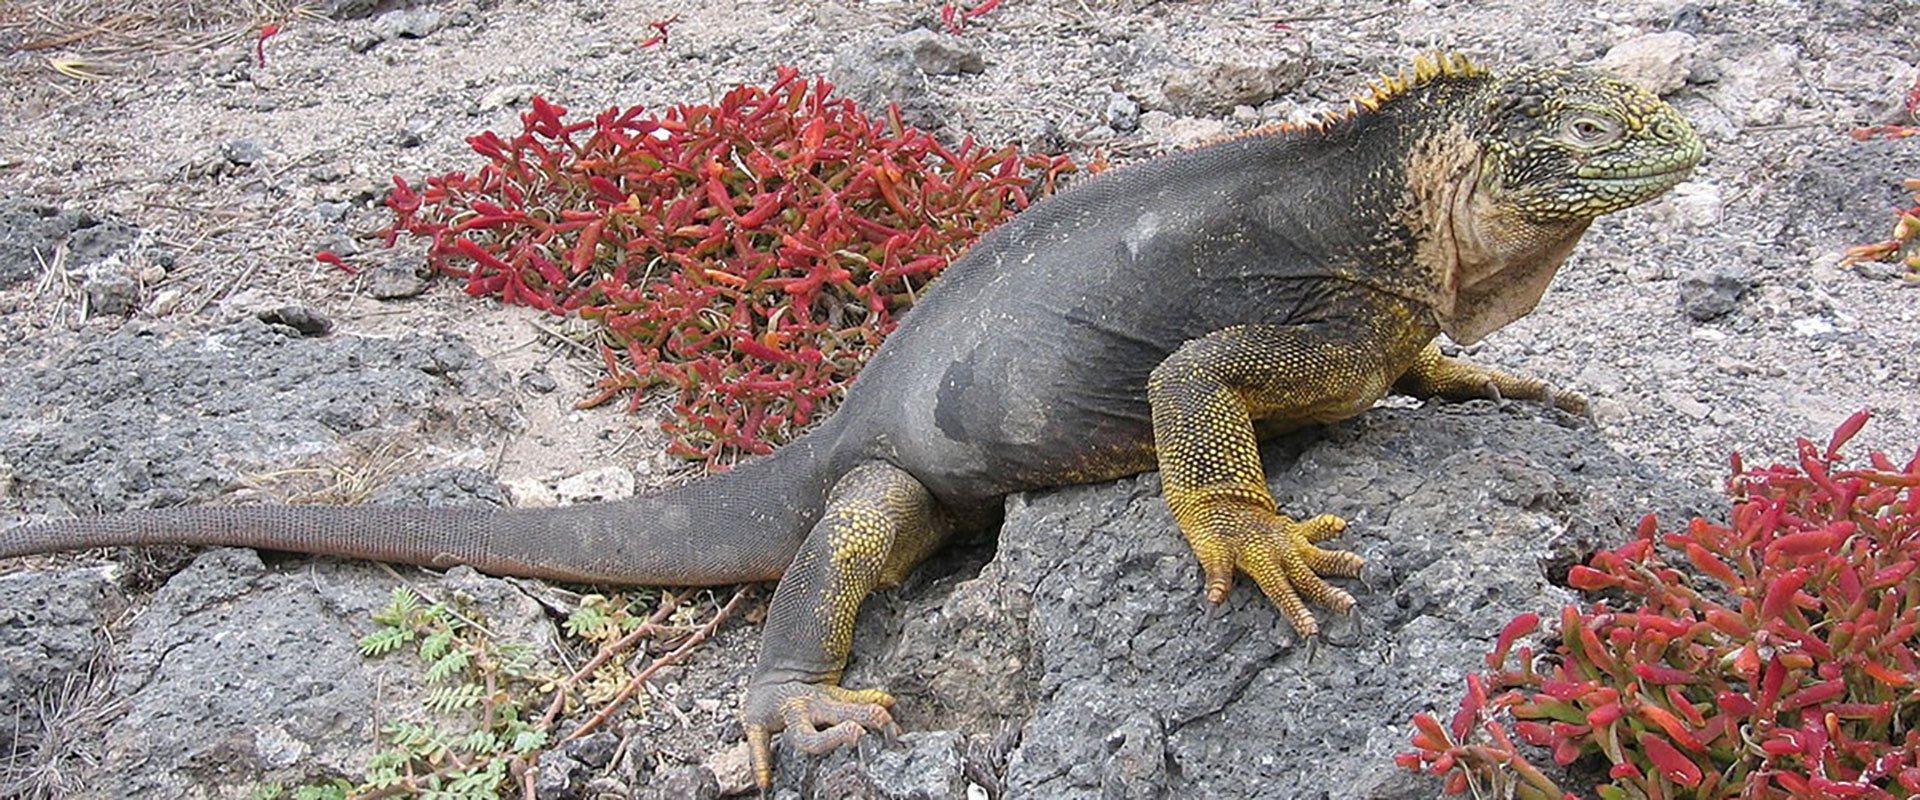 iguane iles galapagos